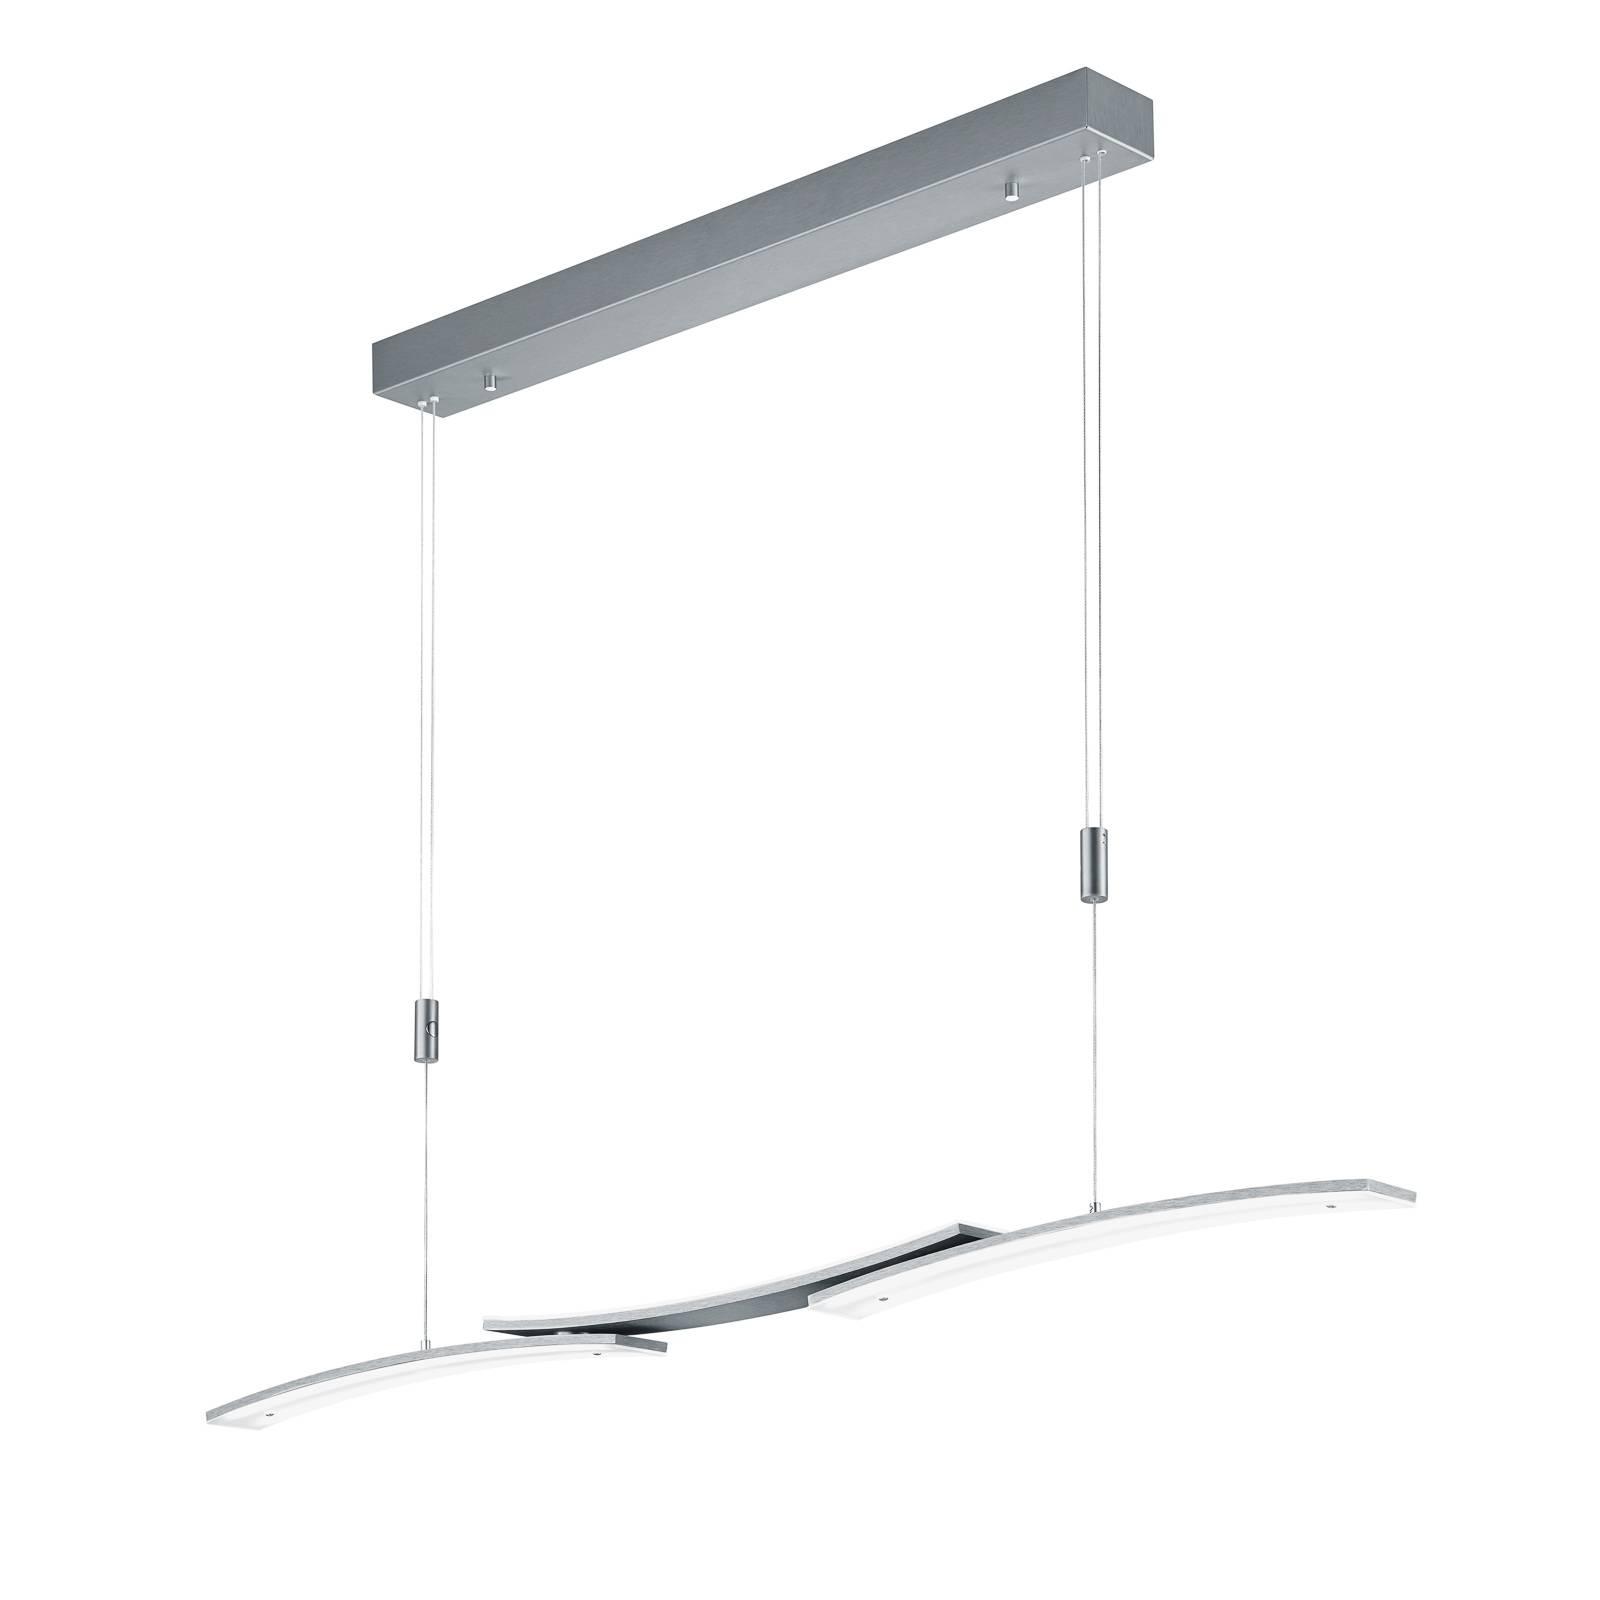 BANKAMP 2138/3-39 LED-riippuvalo antrasiitti matta